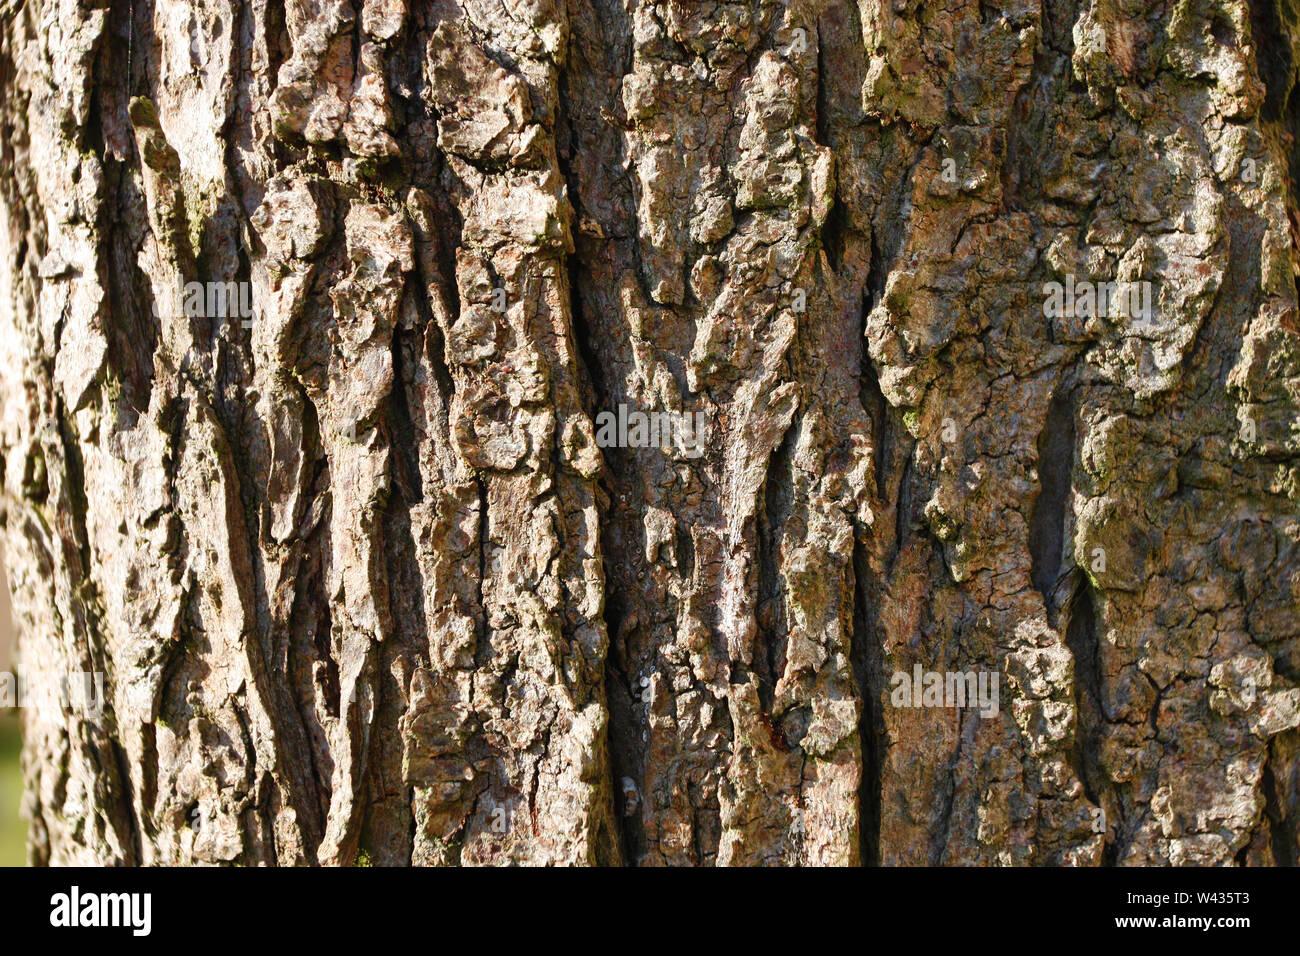 Rough bark of plum tree texture - Stock Image